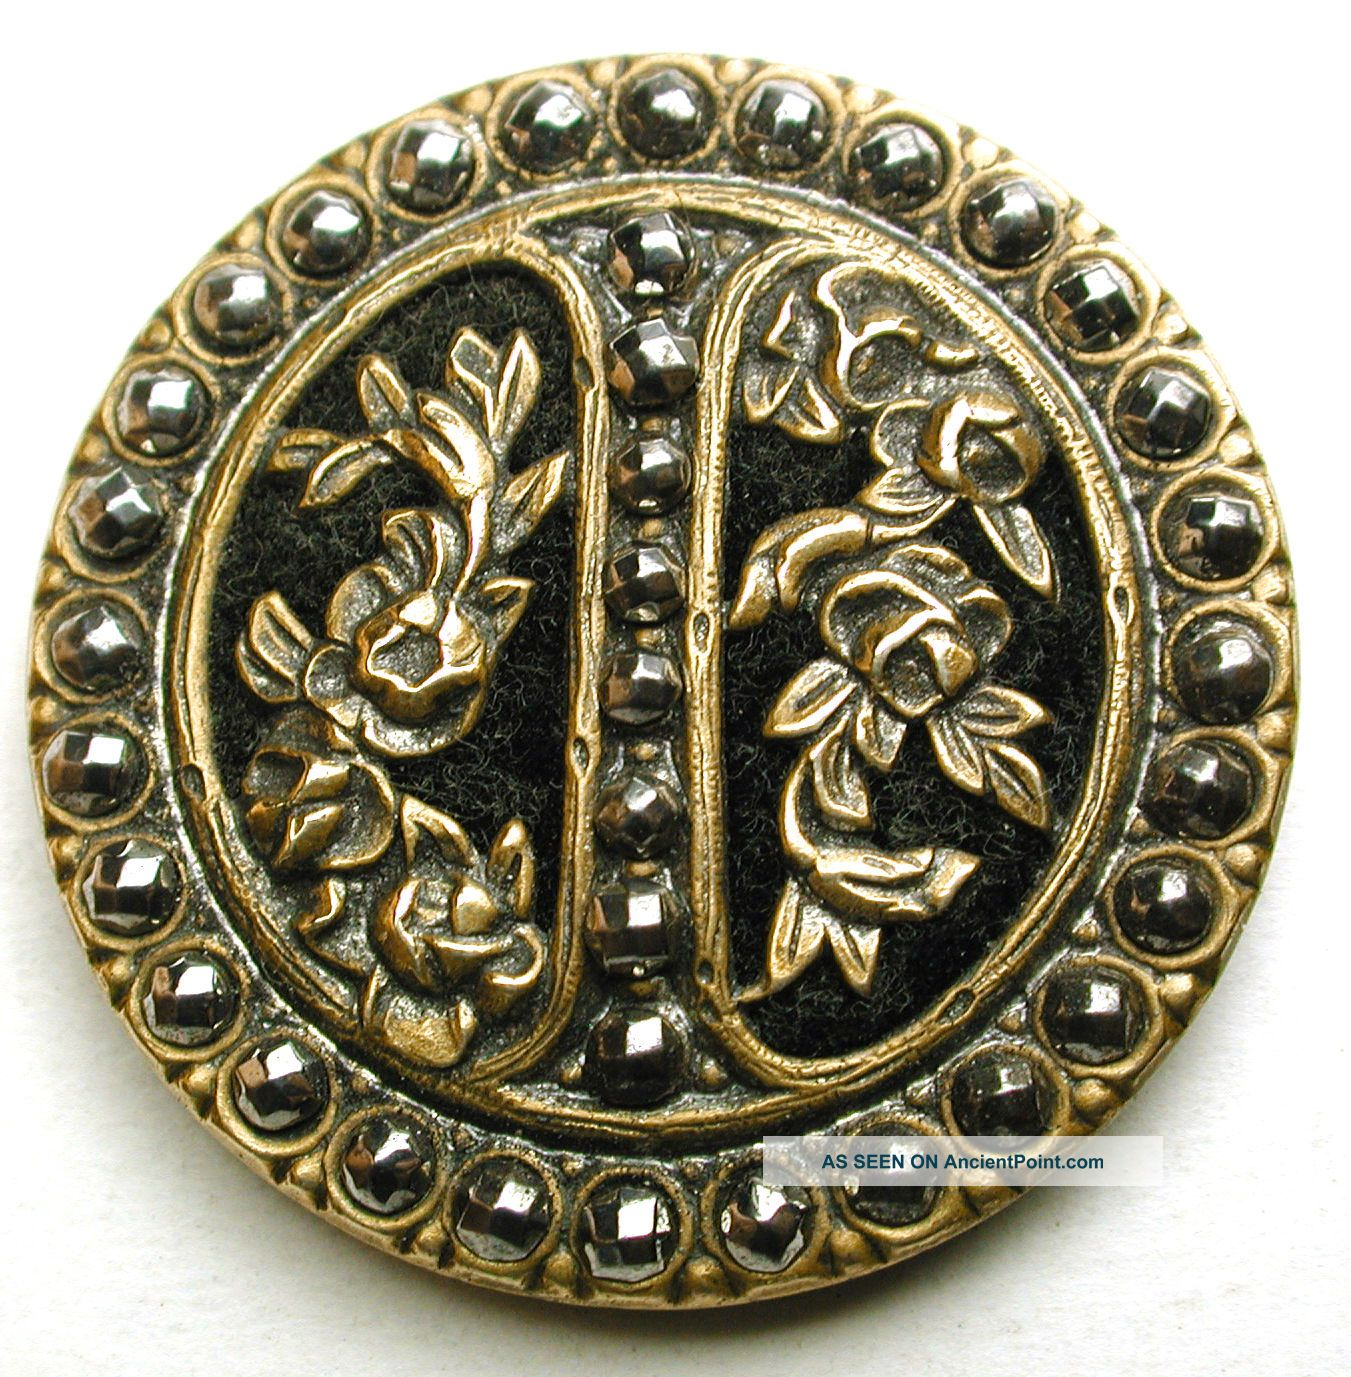 Antique Button Velvet Lined Pierced Brass Roses W Cut Steels Border 1 & 5/16